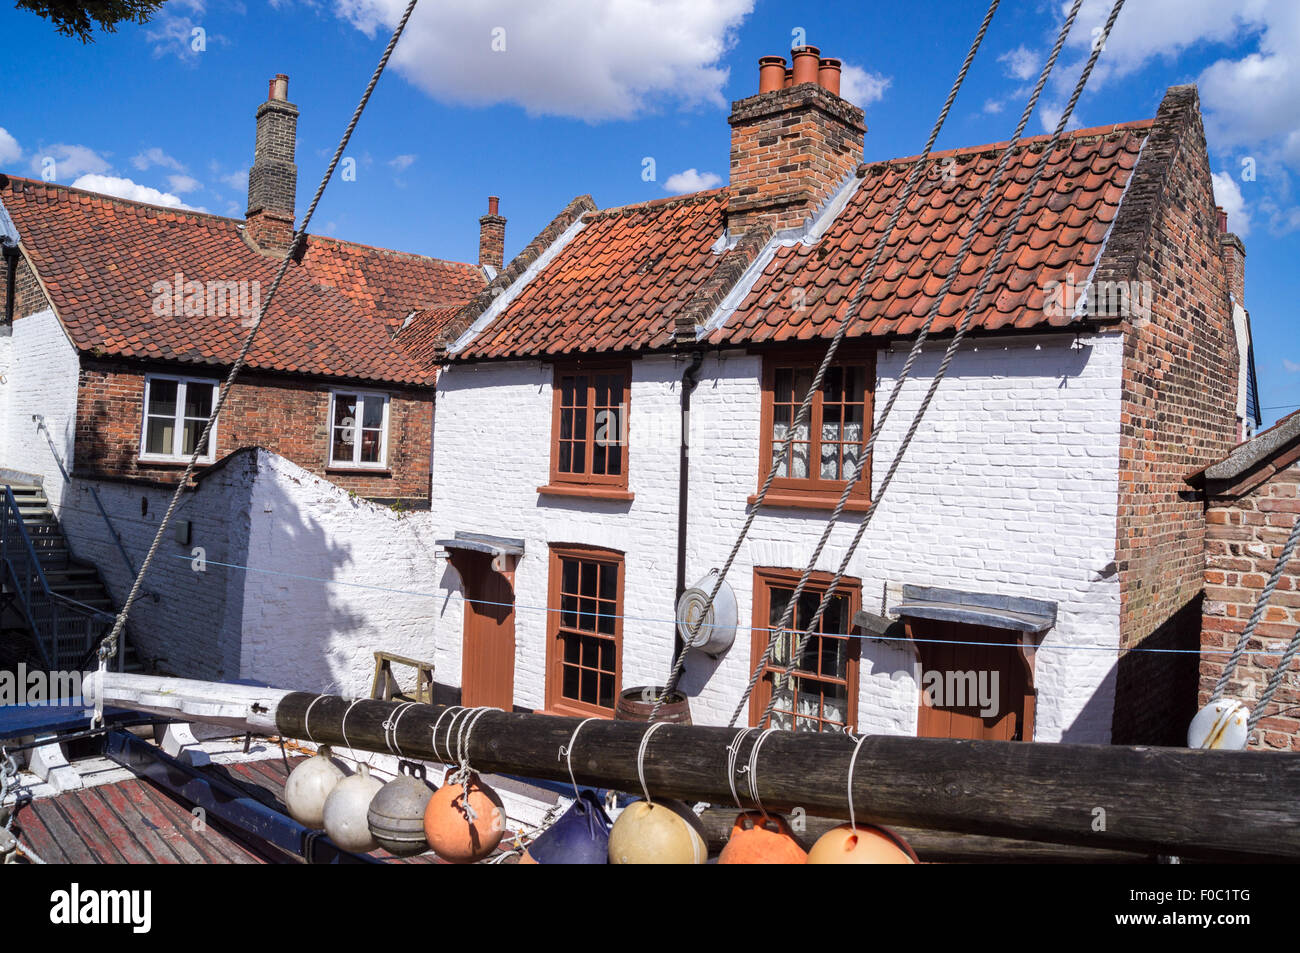 preserved-fishermens-cottages-trues-yard-fisherfolk-museum-kings-lynn-F0C1TG.jpg